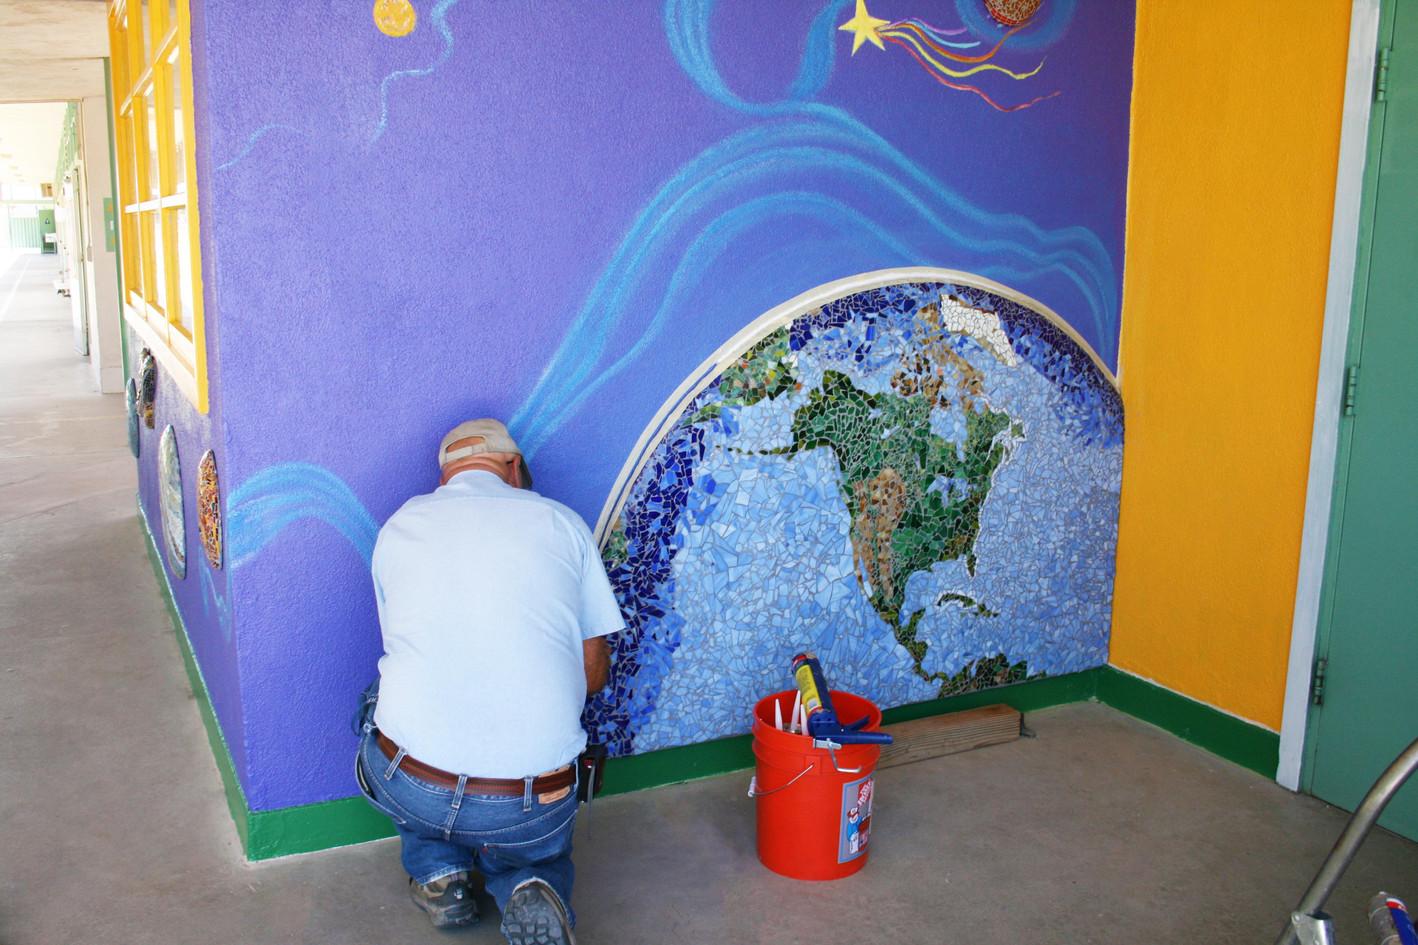 Mosaic world mural at Hedrick Elementary School